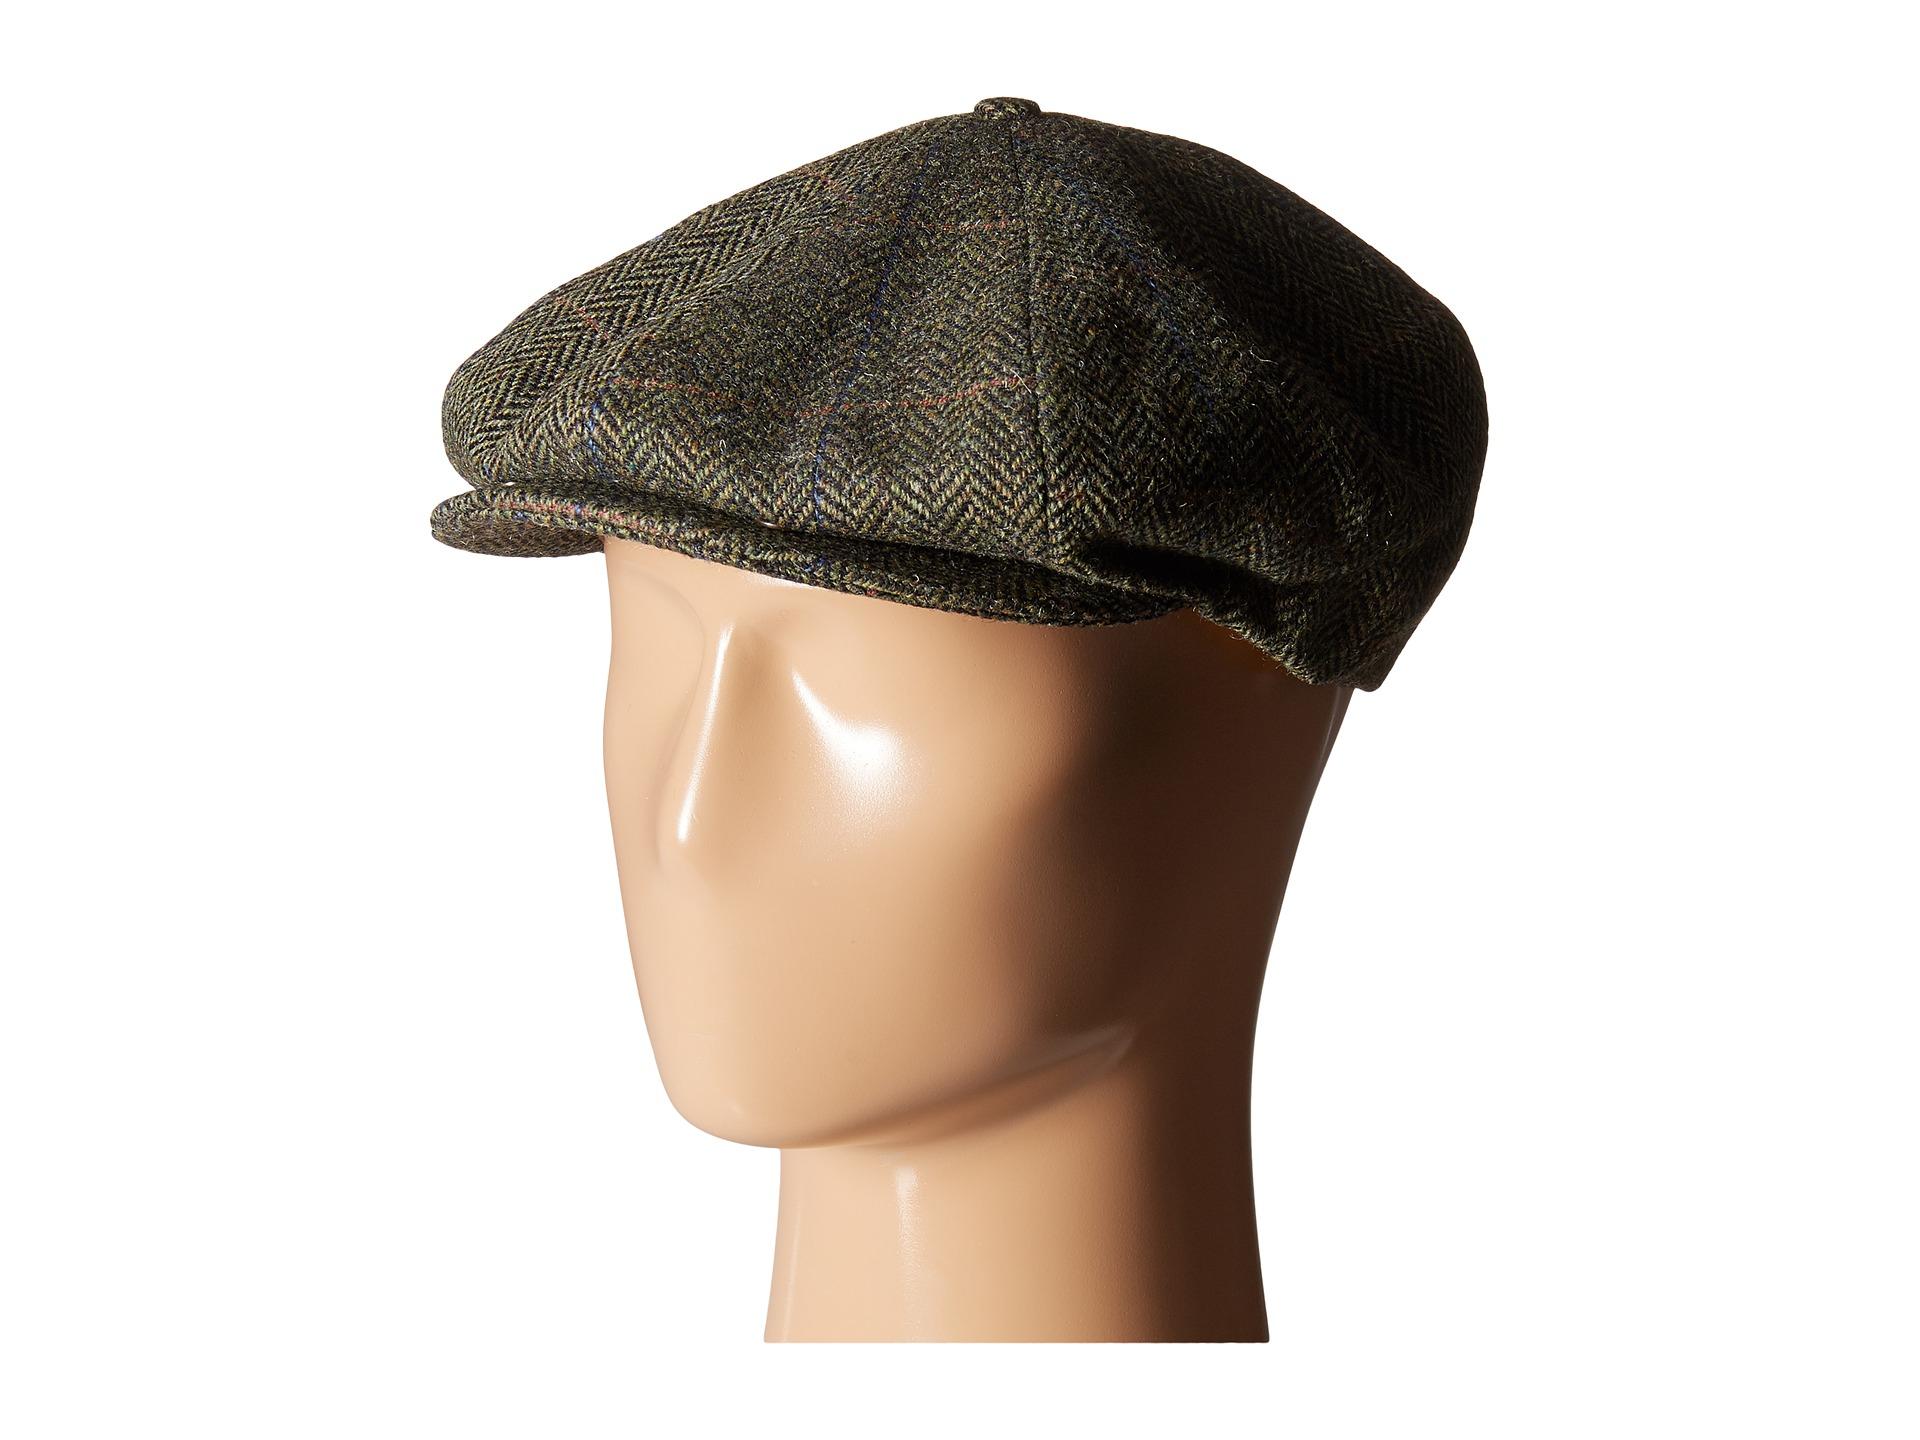 Lyst - Kangol Tweed Ripley in Green for Men 22e72d1425c